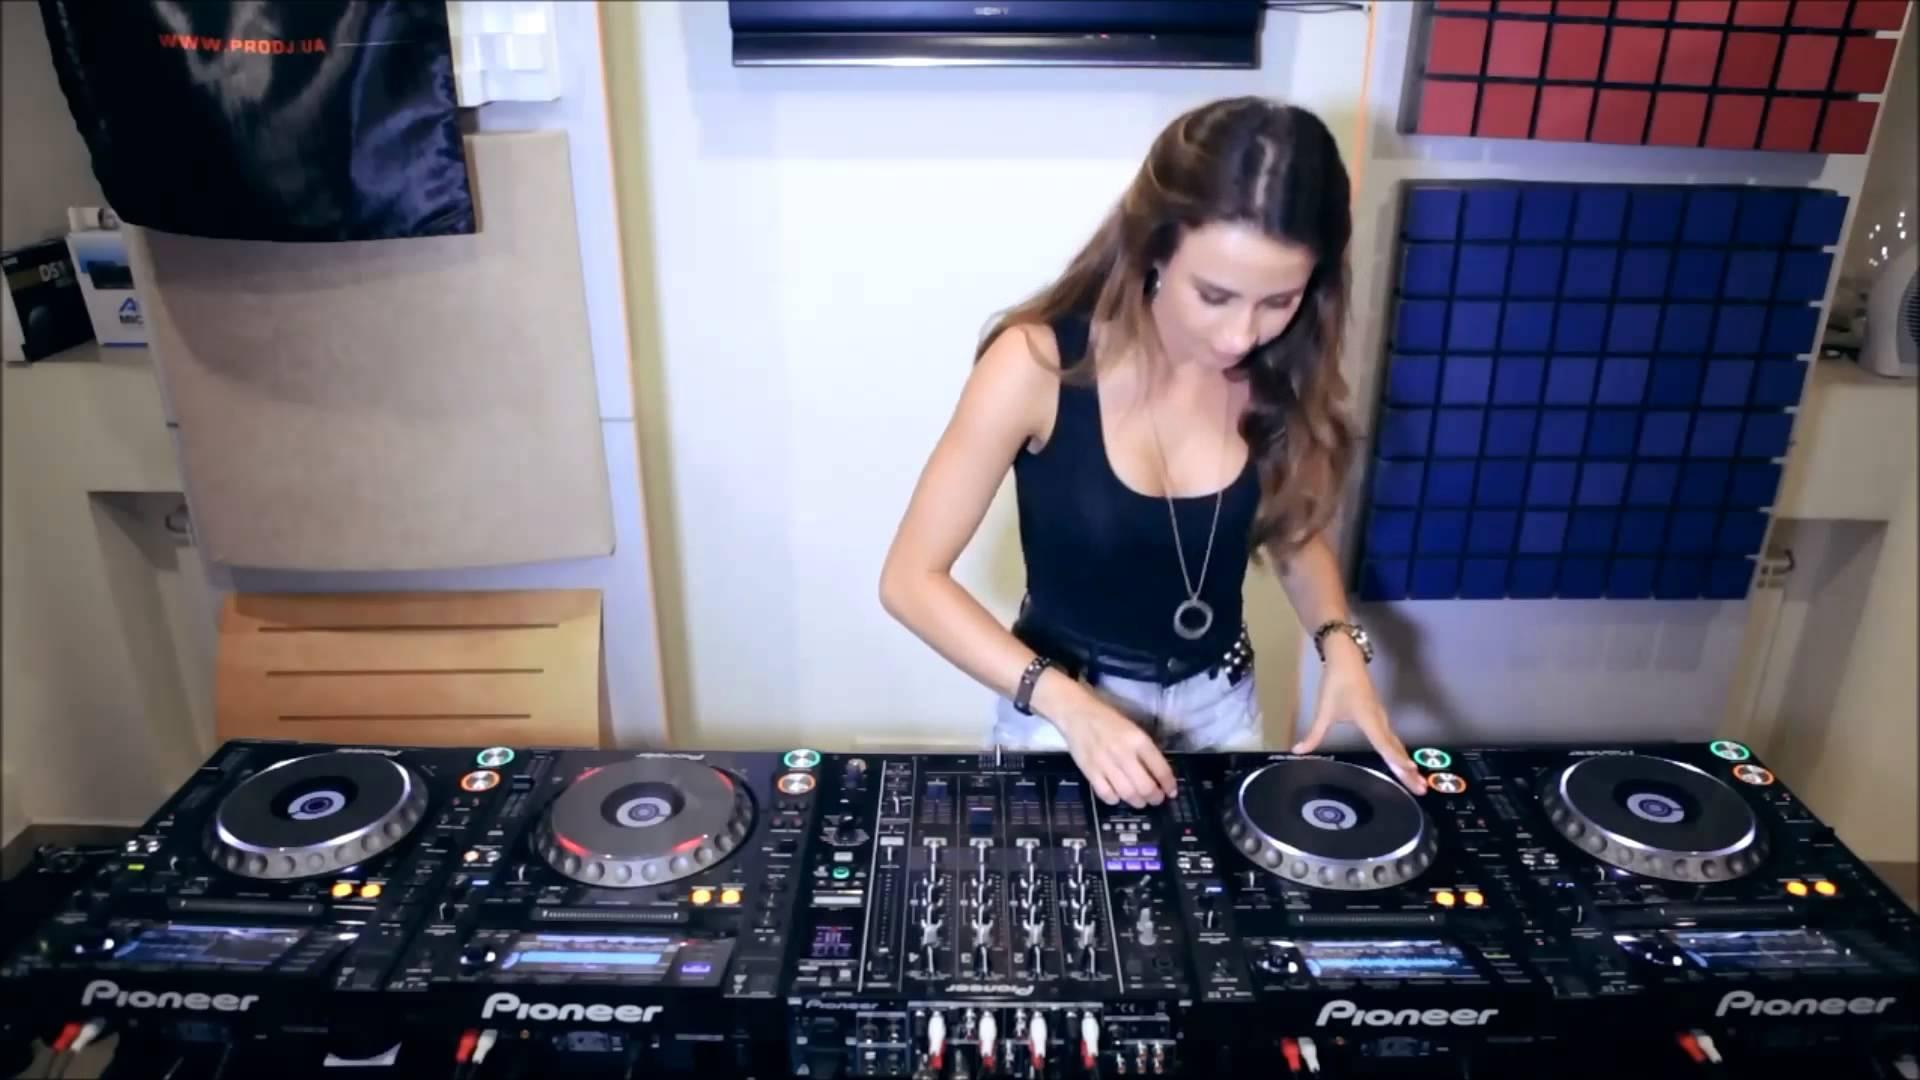 Dj Juicy M Hd Wallpapers: Amazing Mix 2013 / VBOX7